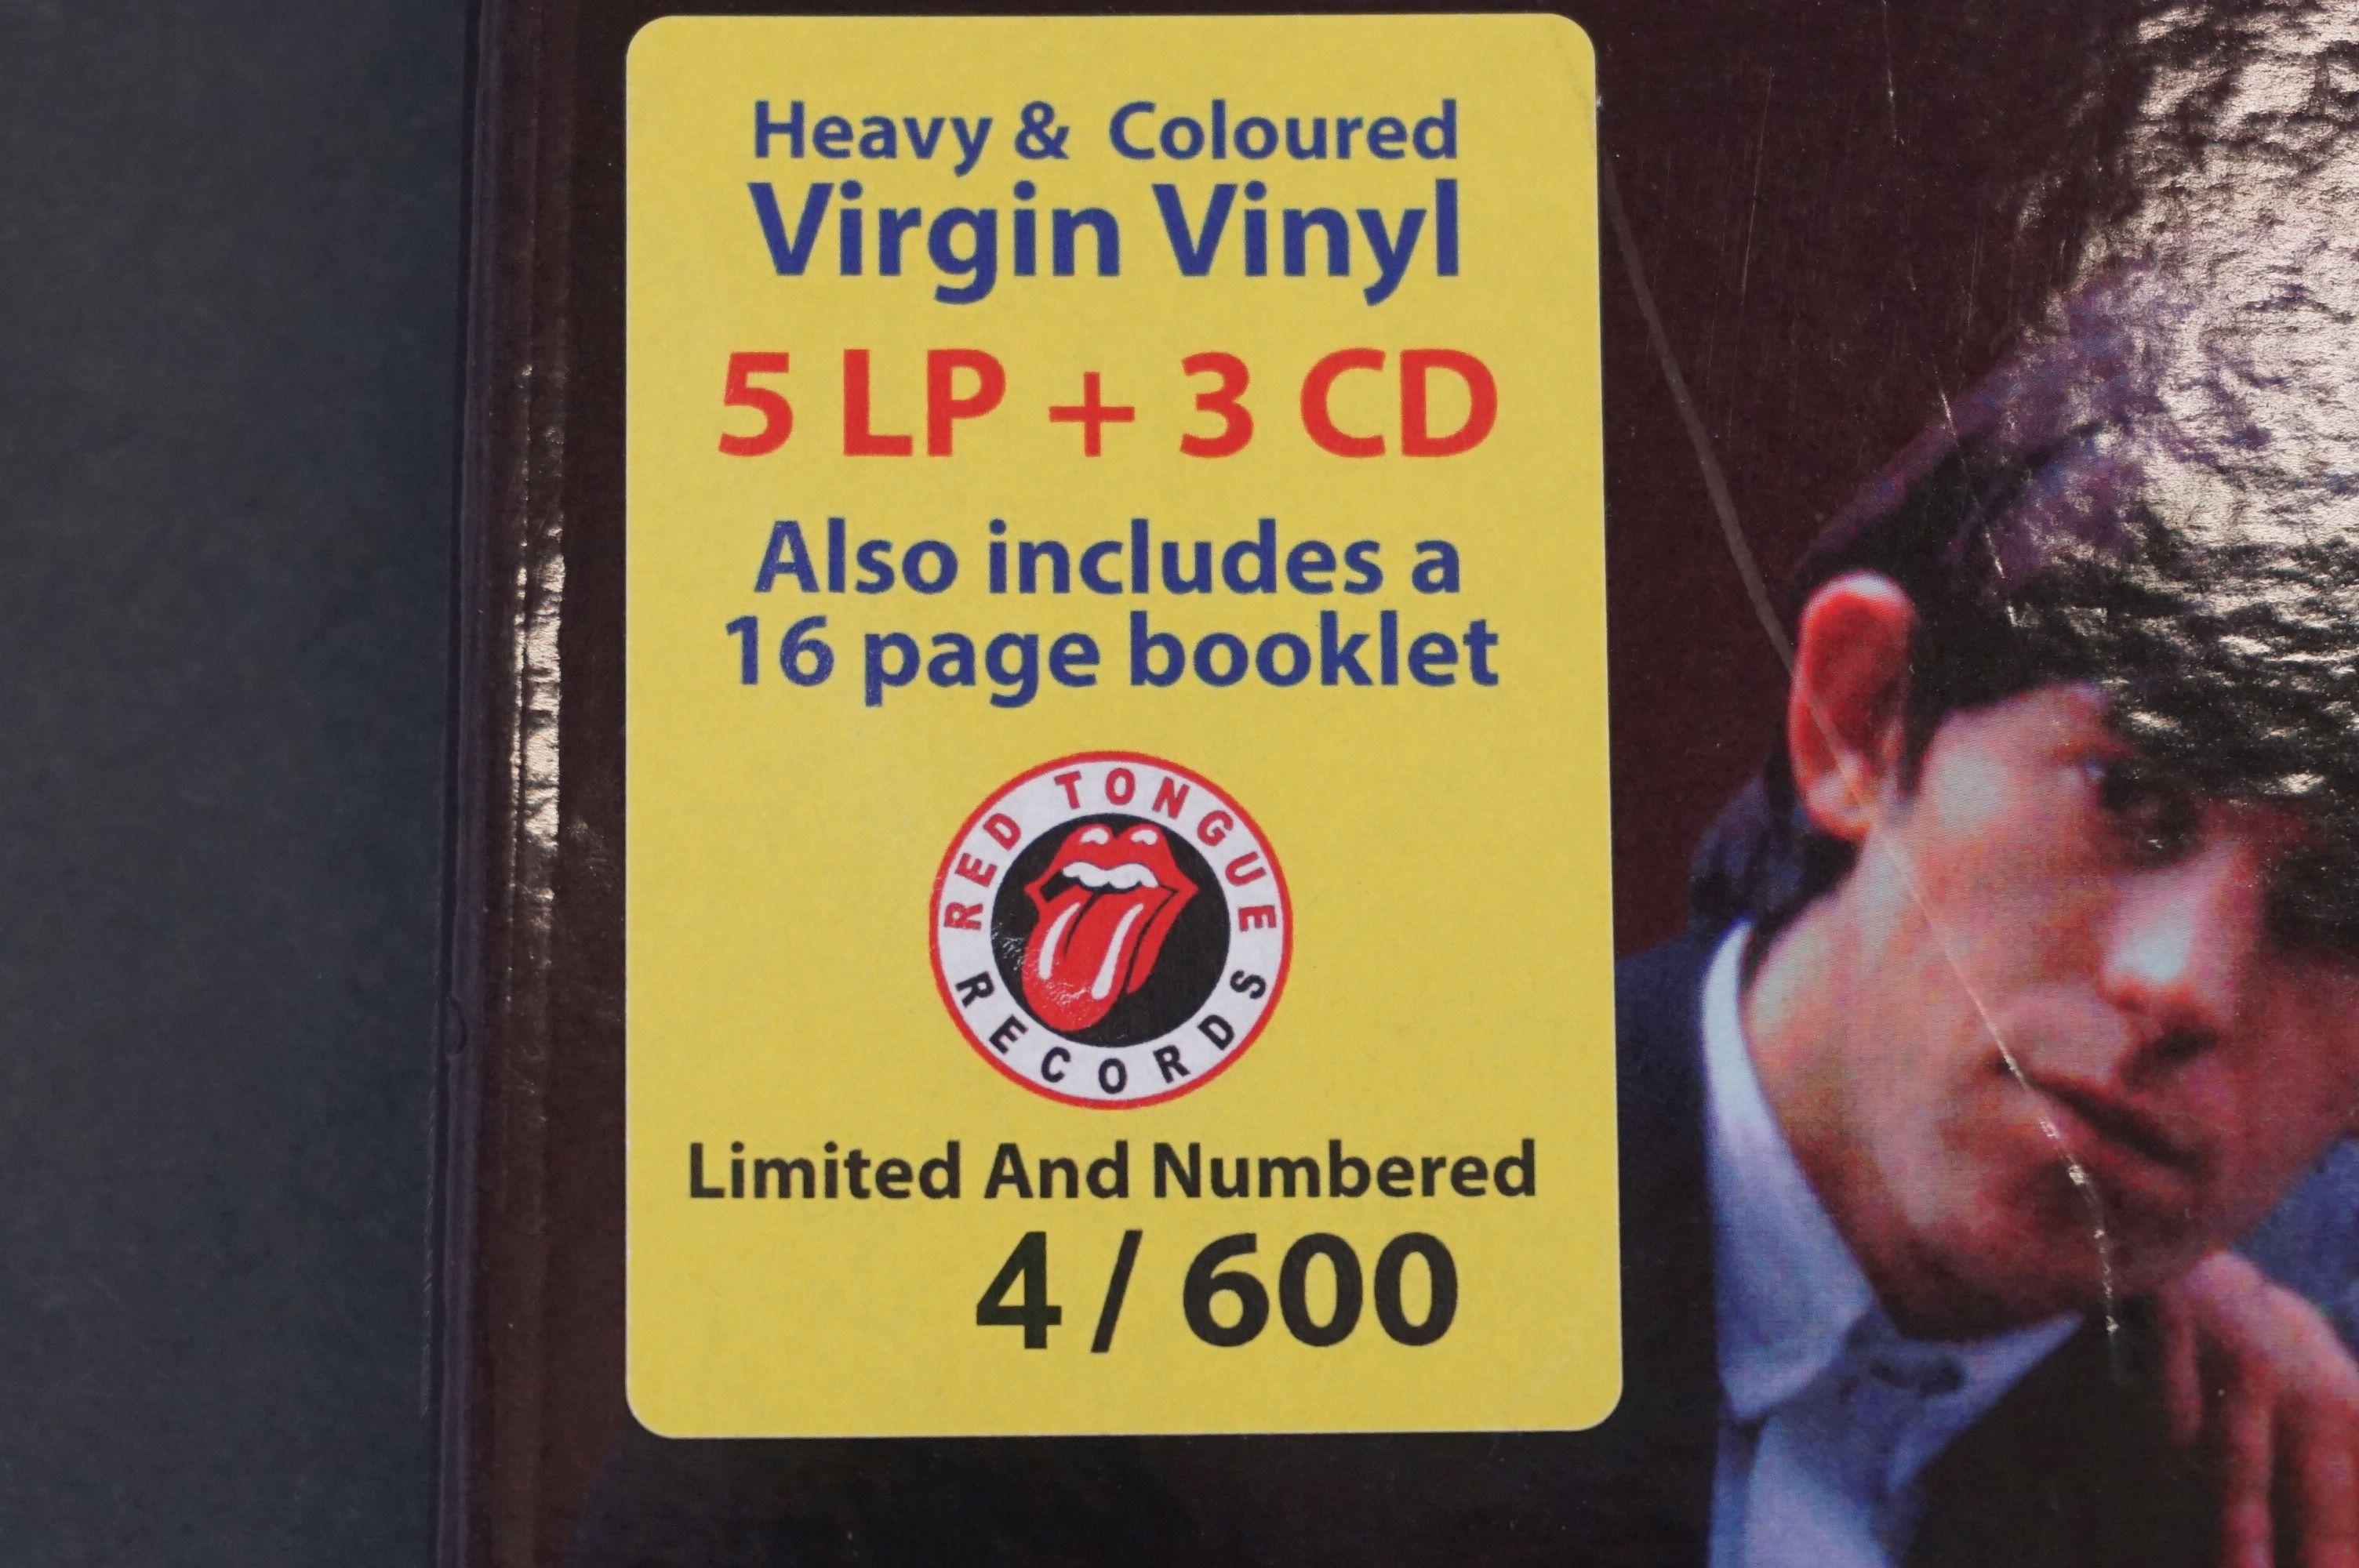 Vinyl - ltd edn The Rolling Stones The Brian Jones Years 5 LP / 3 CD Box Set RTR019, heavy - Image 12 of 12